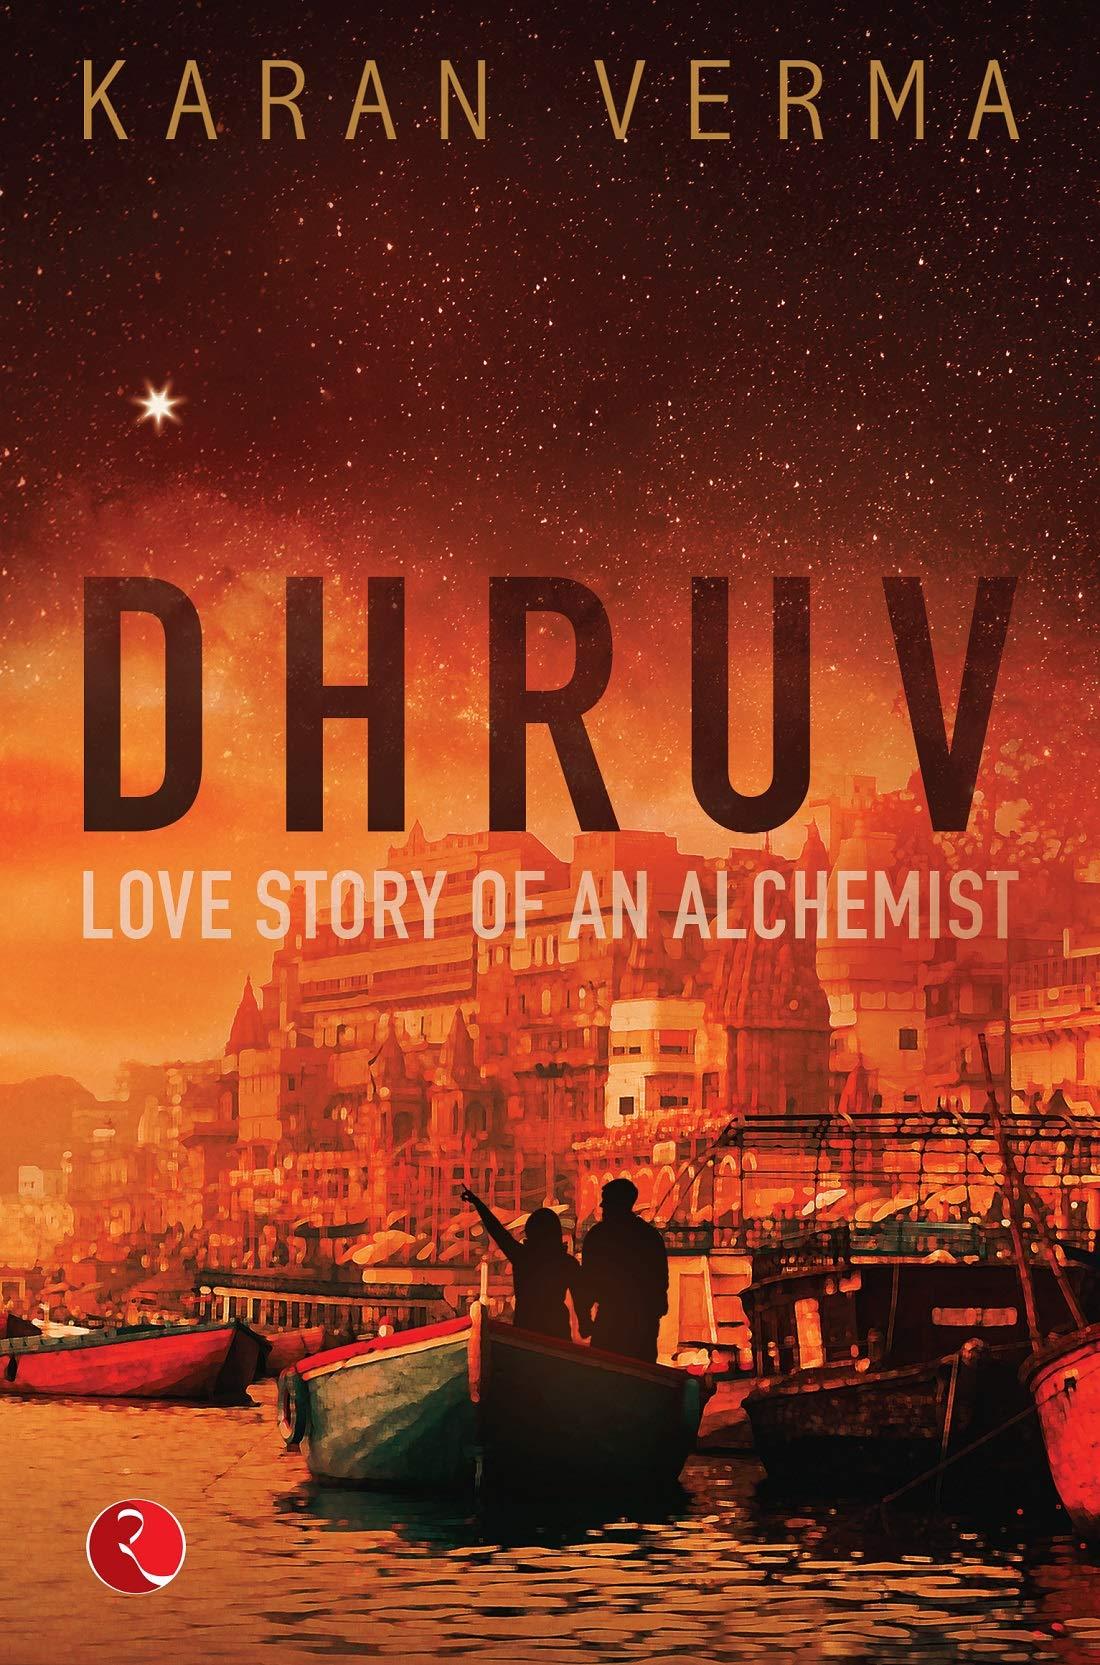 Book Review - Dhruv by Karan Verma